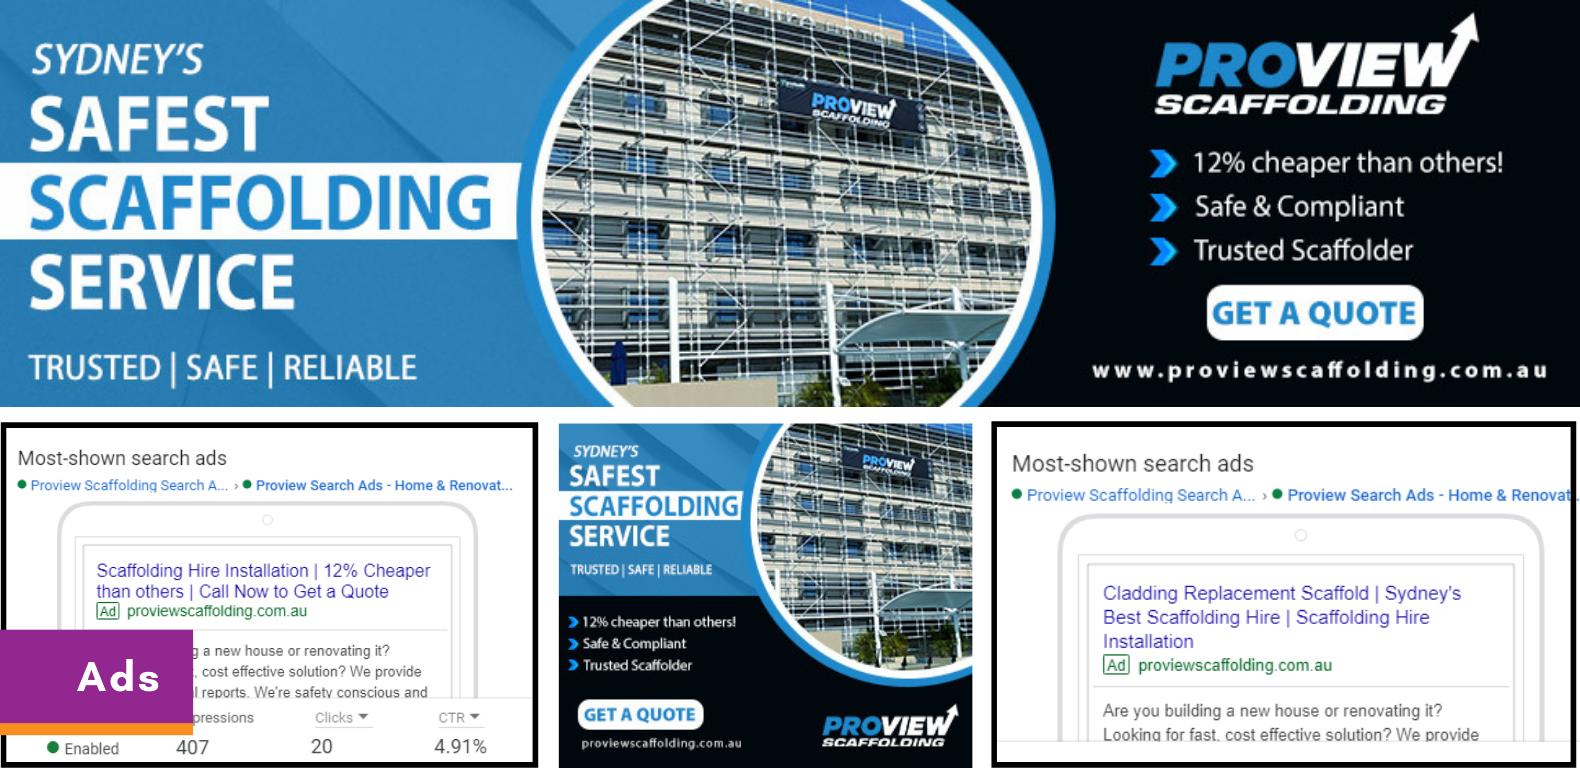 SEM-PPC-Proview-Scaffolding-Australia-Ads